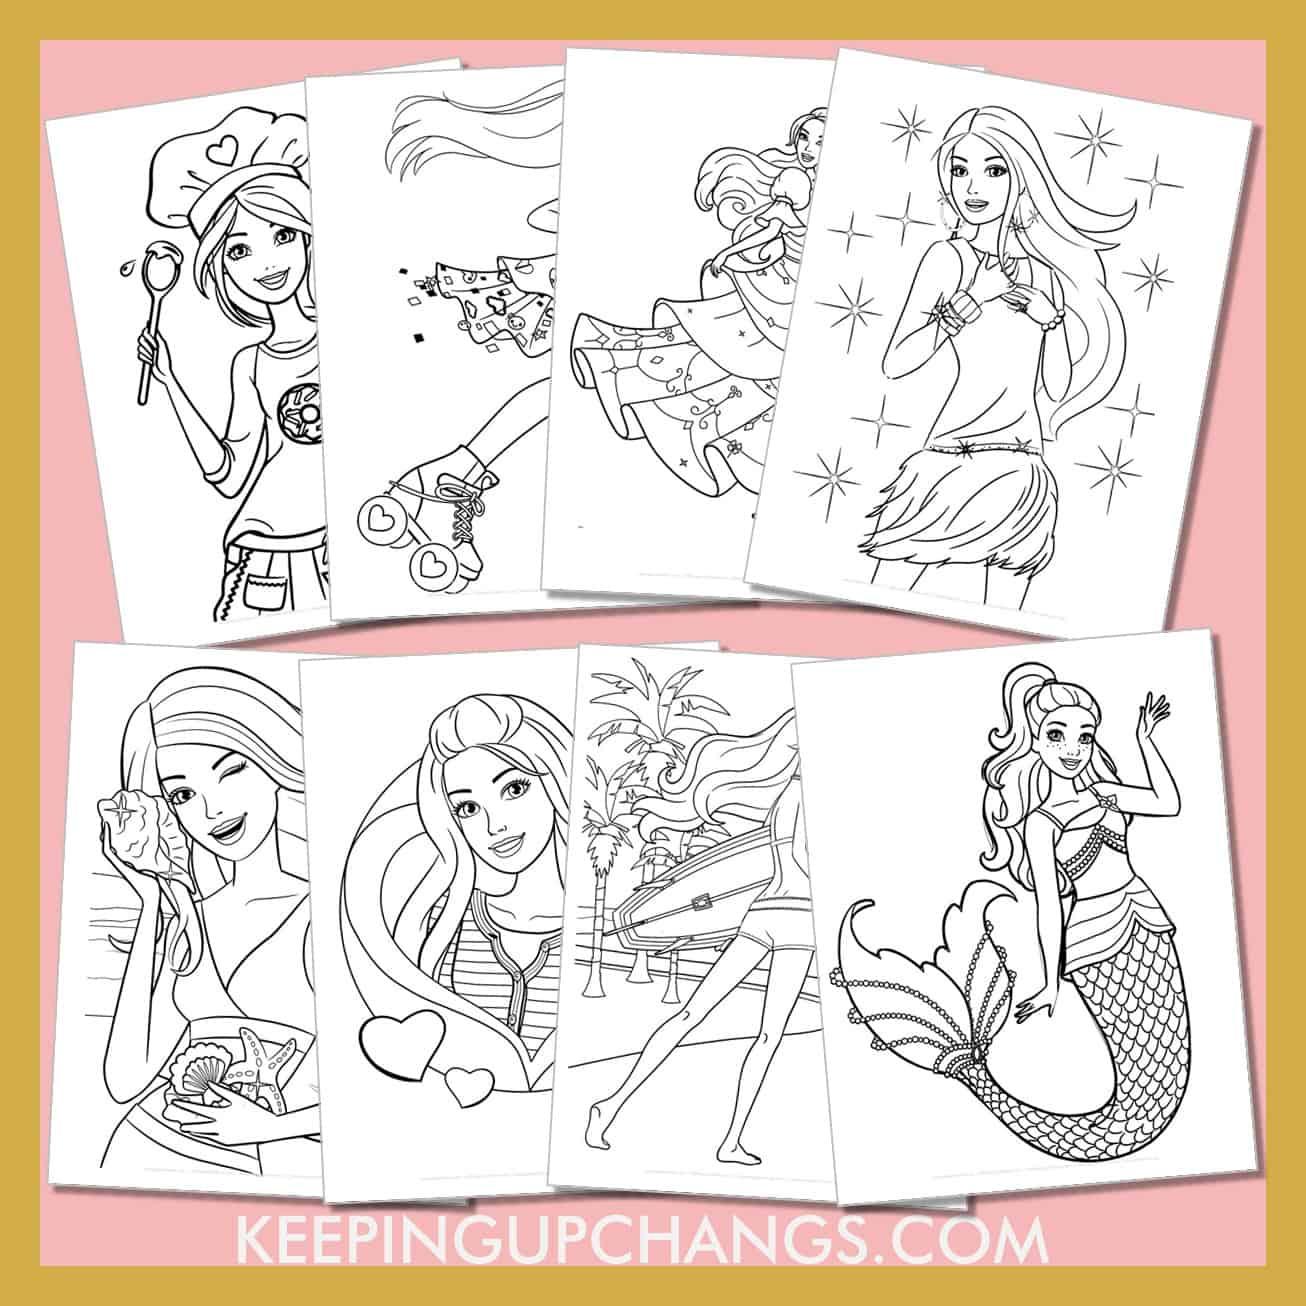 barbie colouring sheets including fashion, princess, mermaid, pop star.